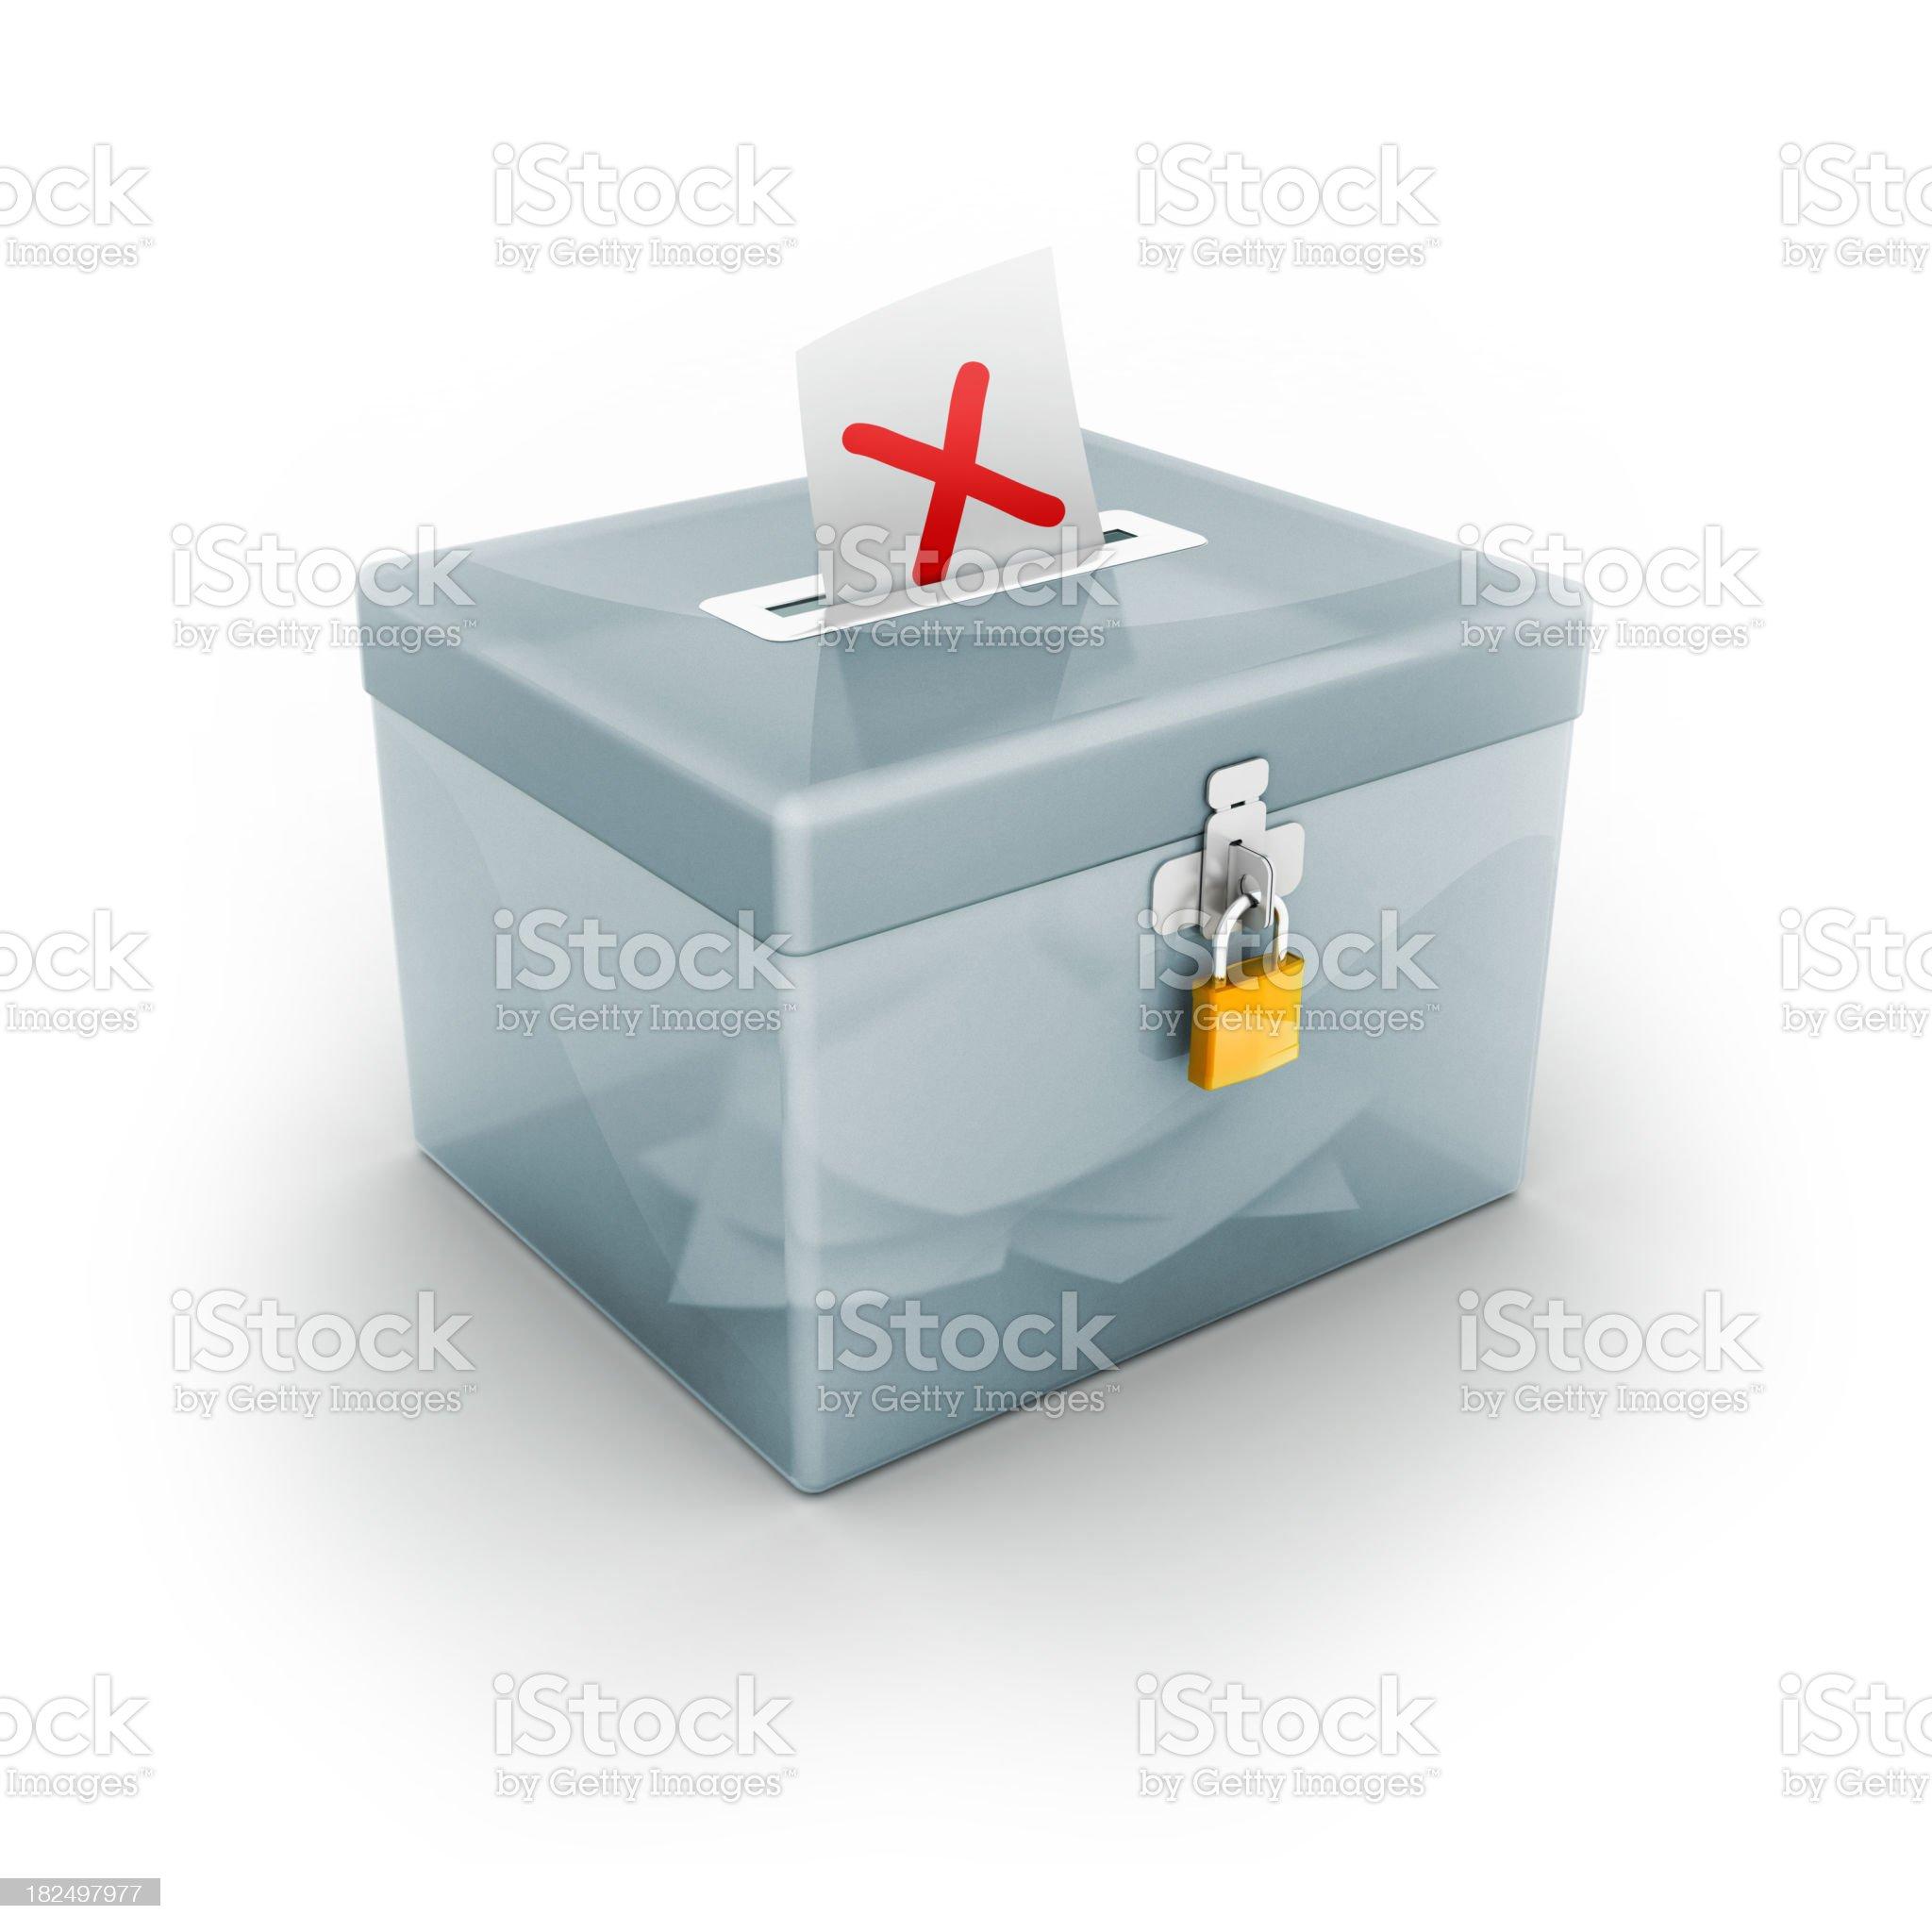 ballot box with x royalty-free stock photo